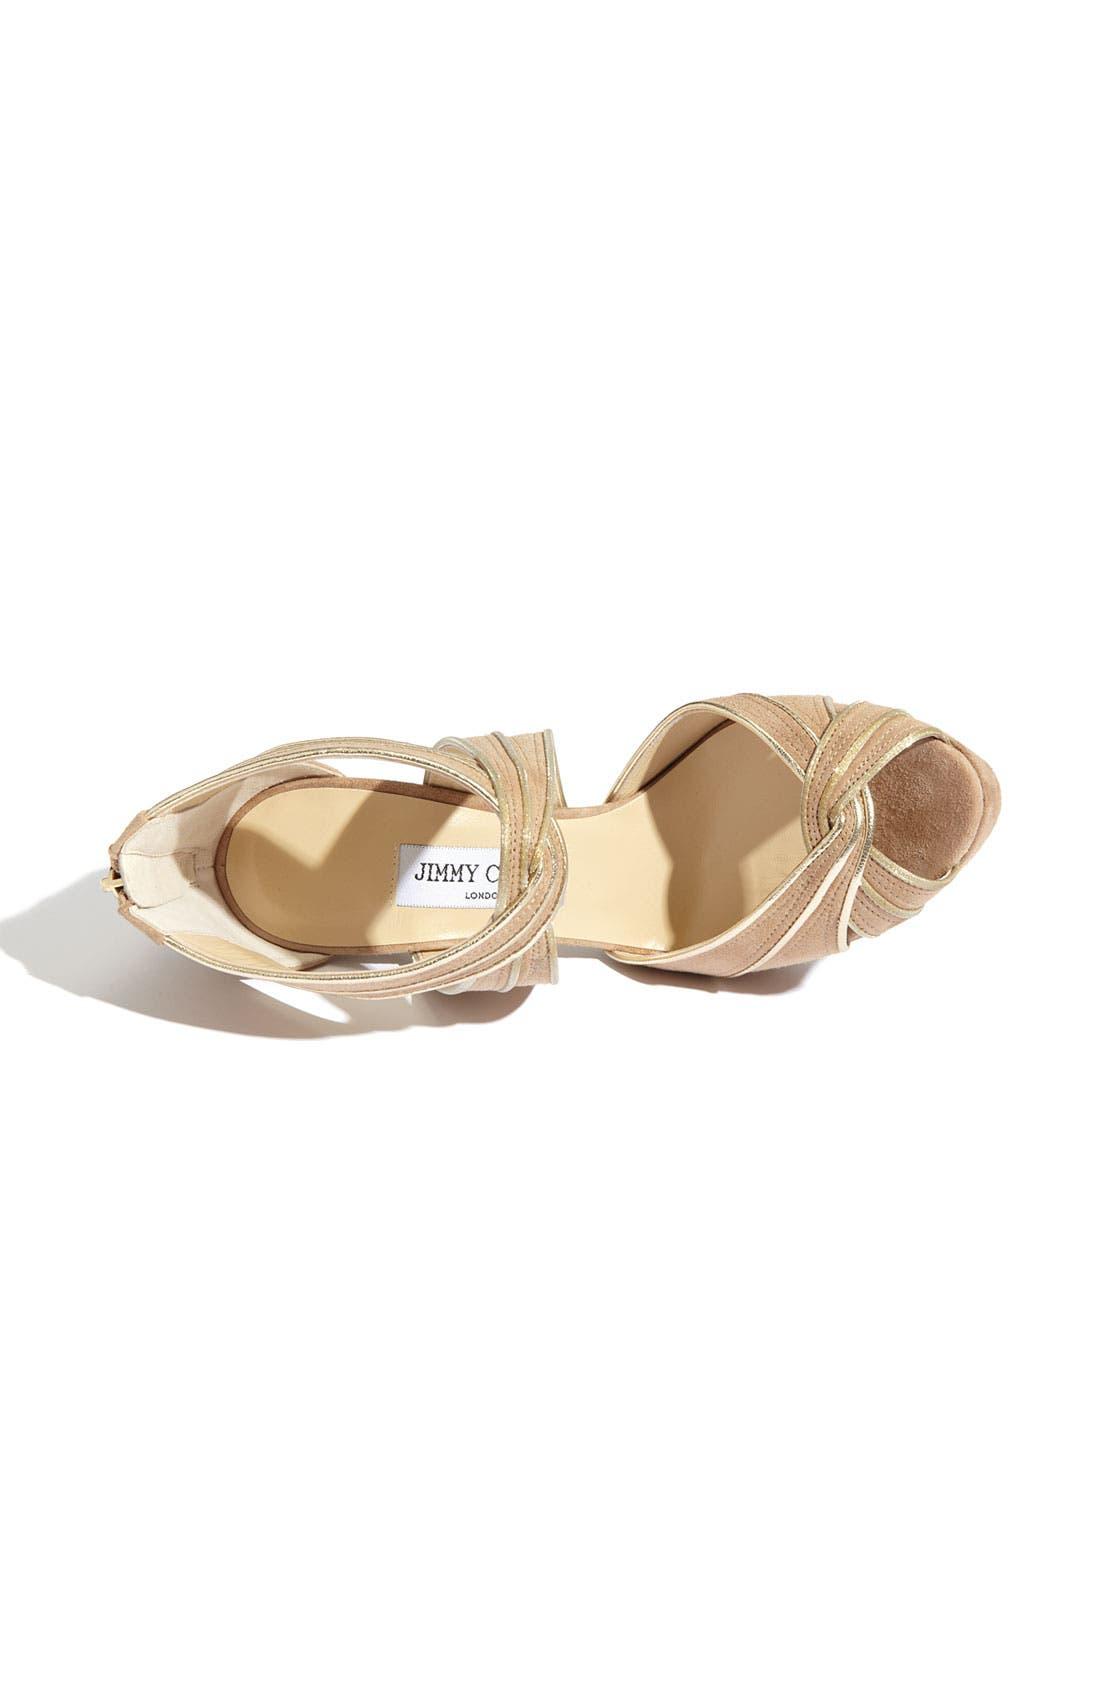 Alternate Image 3  - Jimmy Choo 'Koko' Piped Platform Sandal